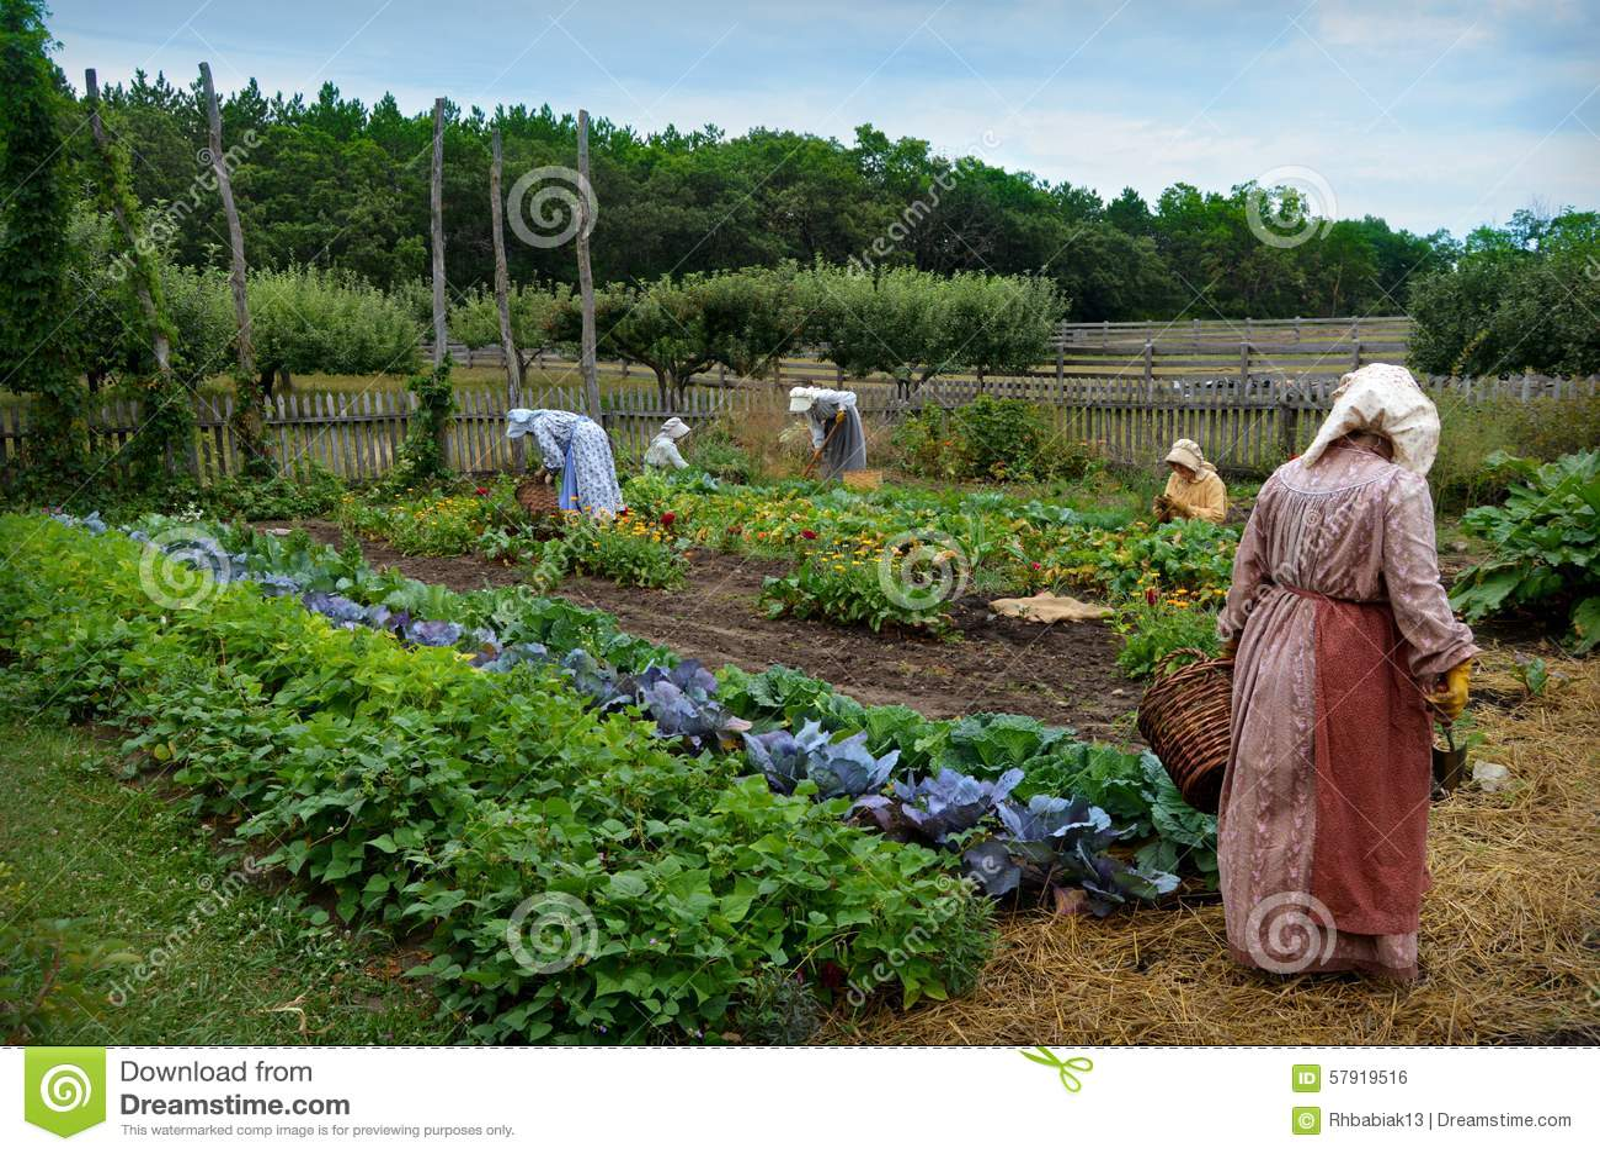 Backyard Vegetable Garden Business : Five pioneer women working in a vegetable garden at Old World